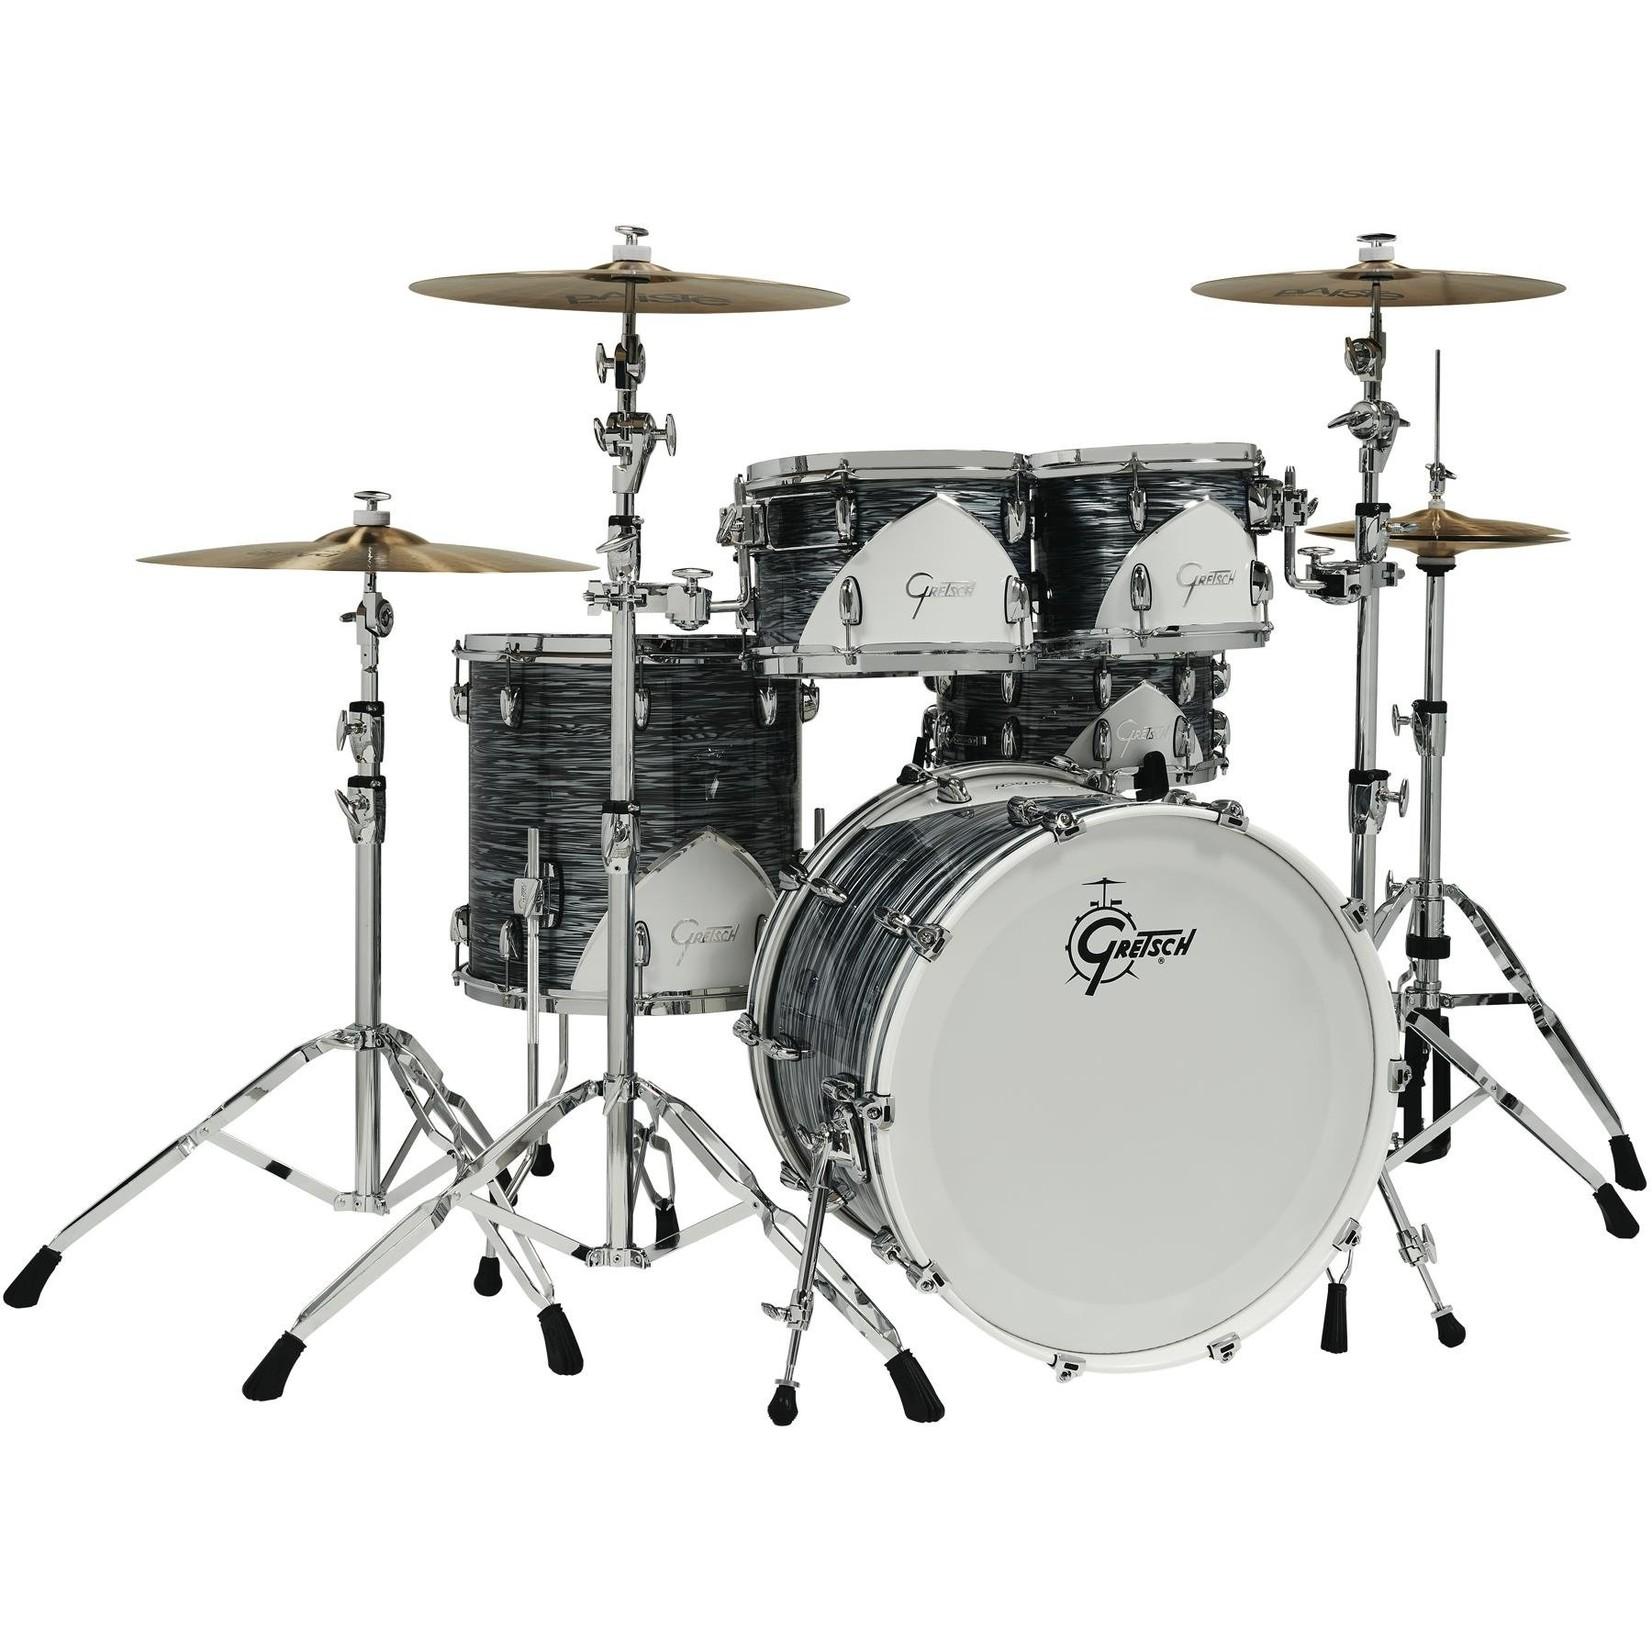 "Gretsch Gretsch Renown '57 5pc Drum Kit ""Silver Oyster Pearl"""